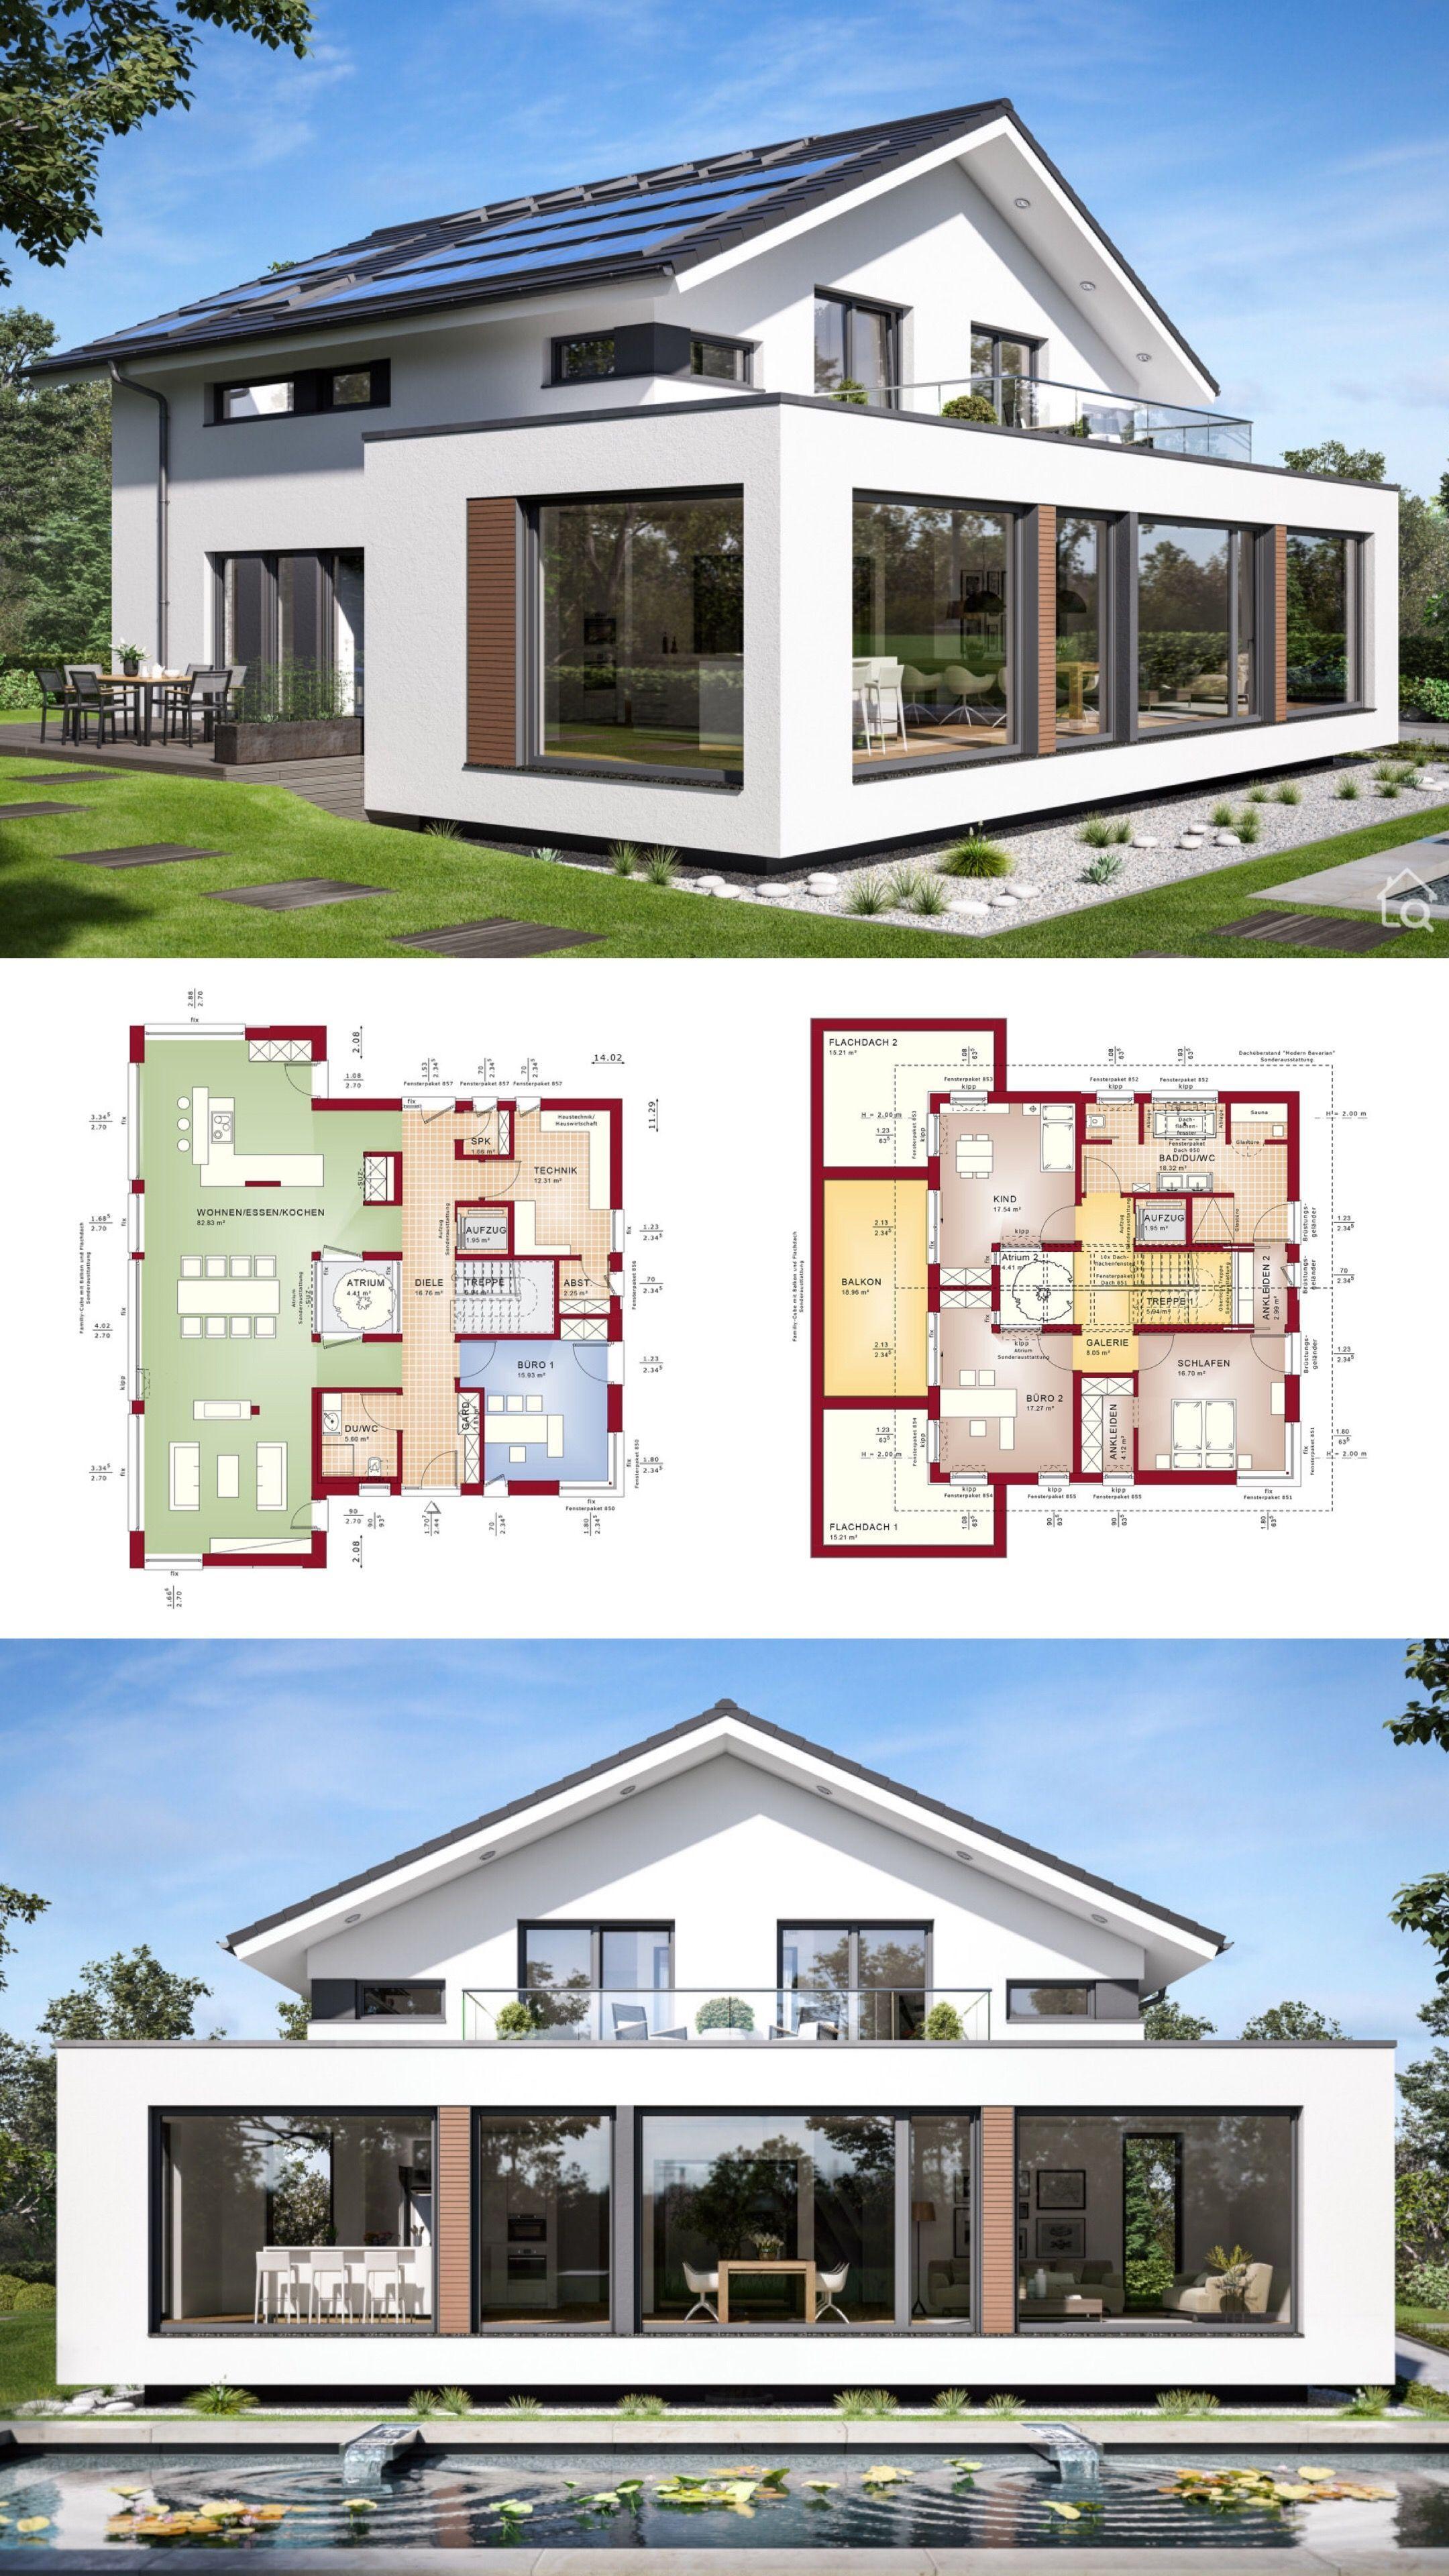 Modernes Haus Concept M 210 Gunzburg Bien Zenker Hausbaudirekt De Arc In 2020 Residential Architecture Plan Interior Architecture Design Architecture Design Concept